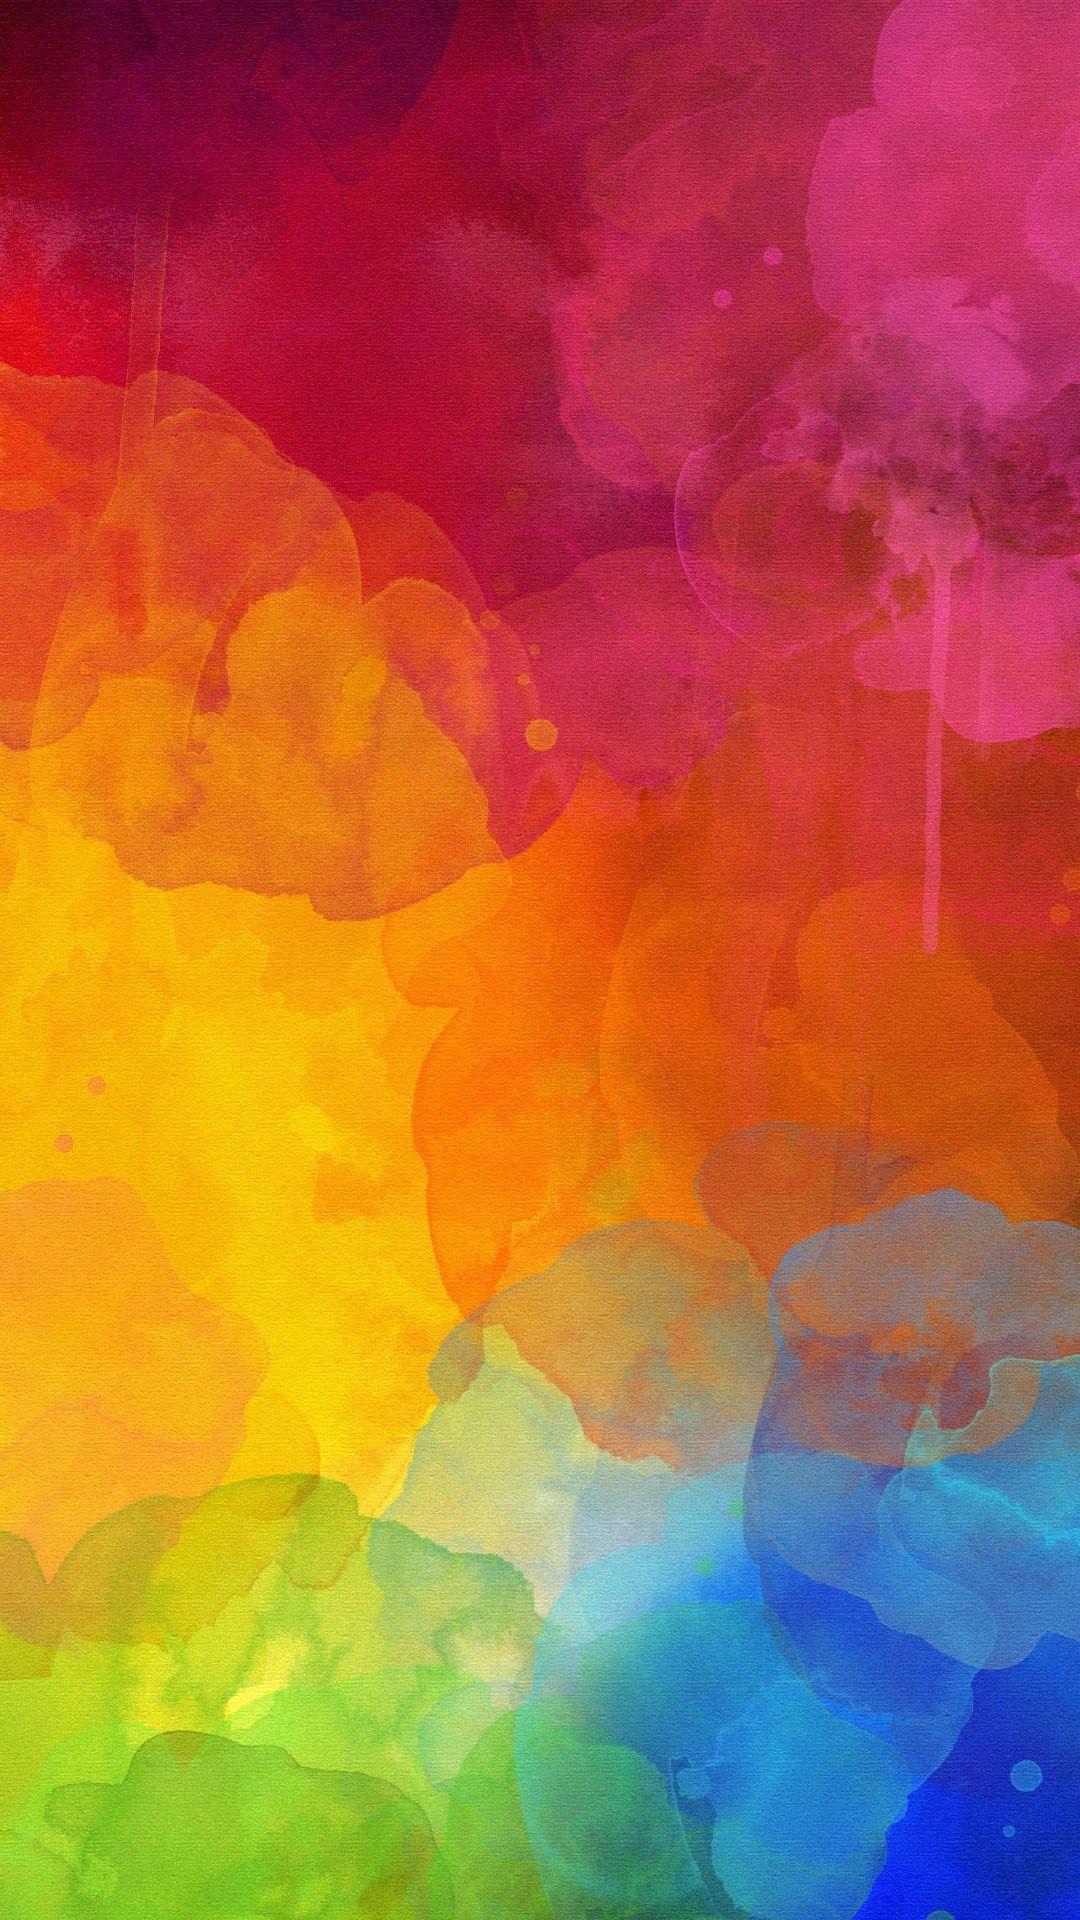 Lockscreen Wallpapers For Iphone 6 Plus Color Wallpaper Iphone